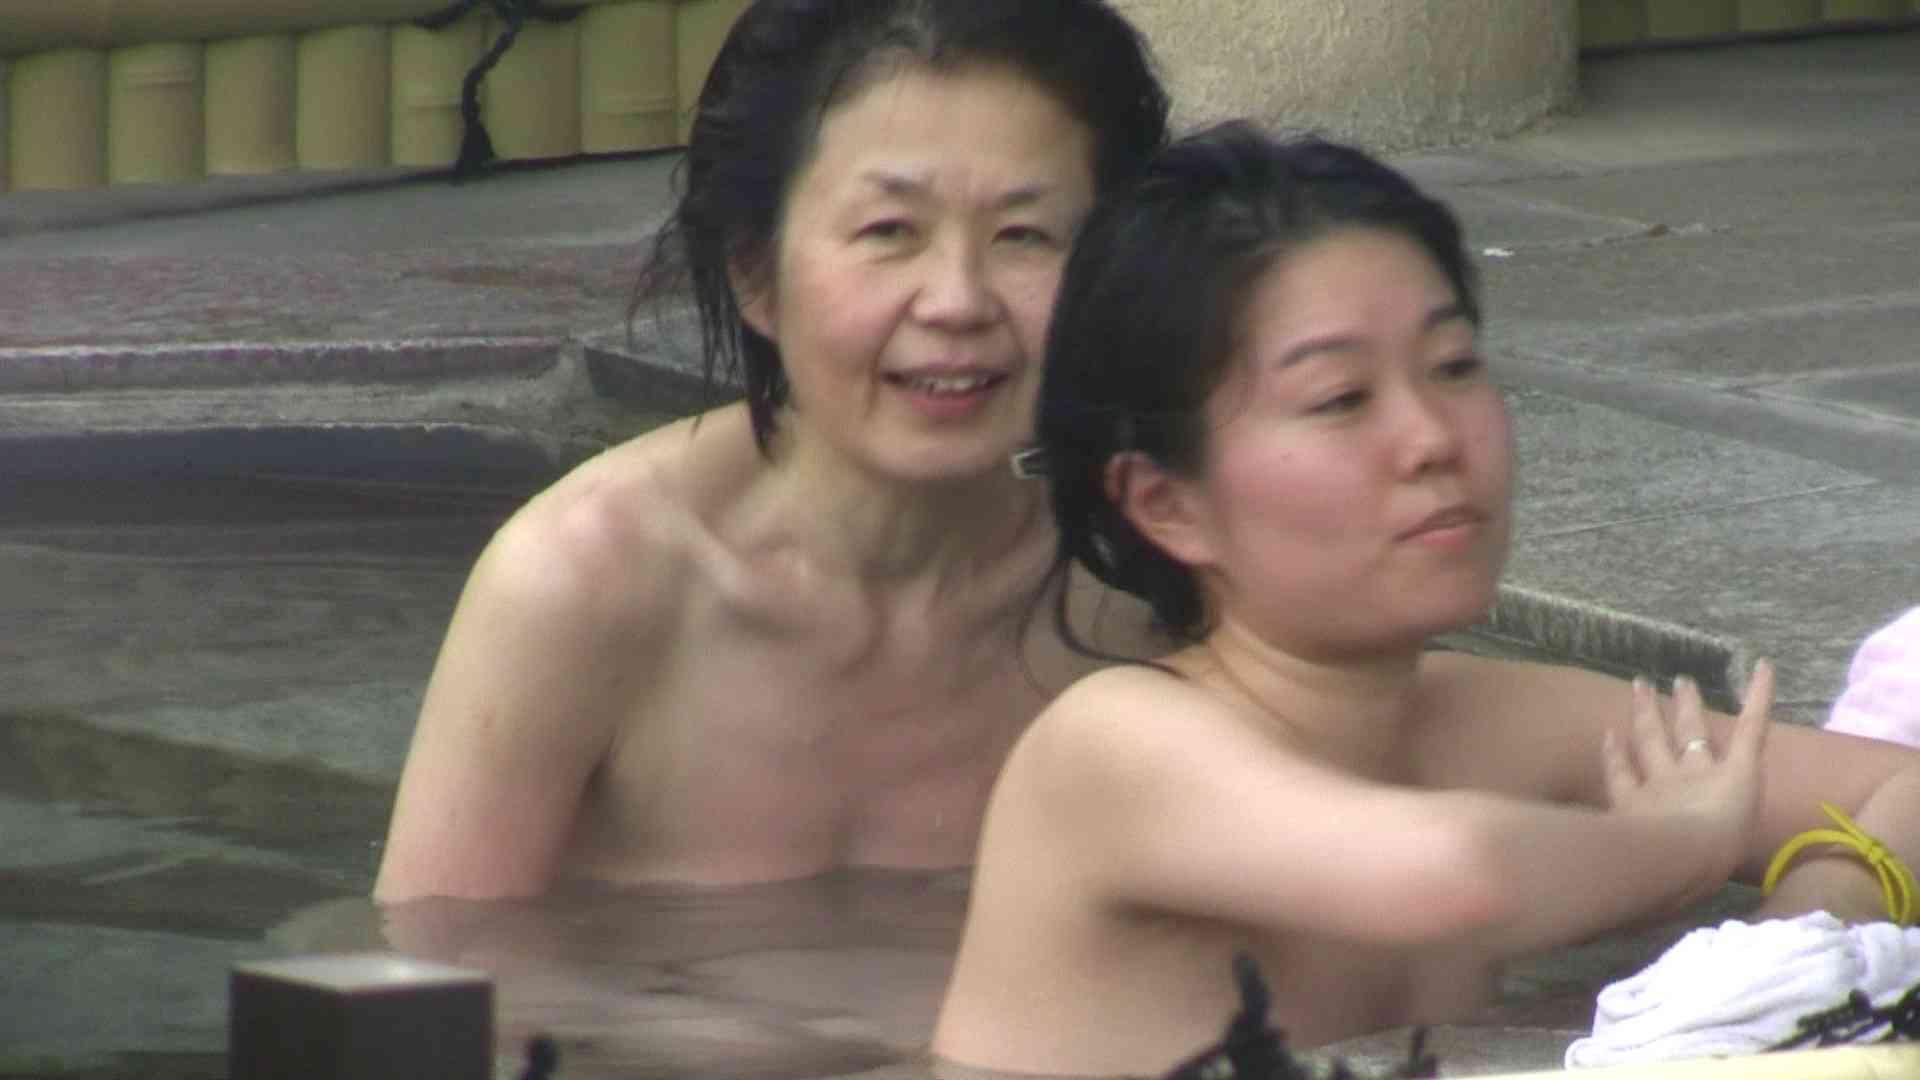 Aquaな露天風呂Vol.675 OLのプライベート   盗撮特撮  10pic 10